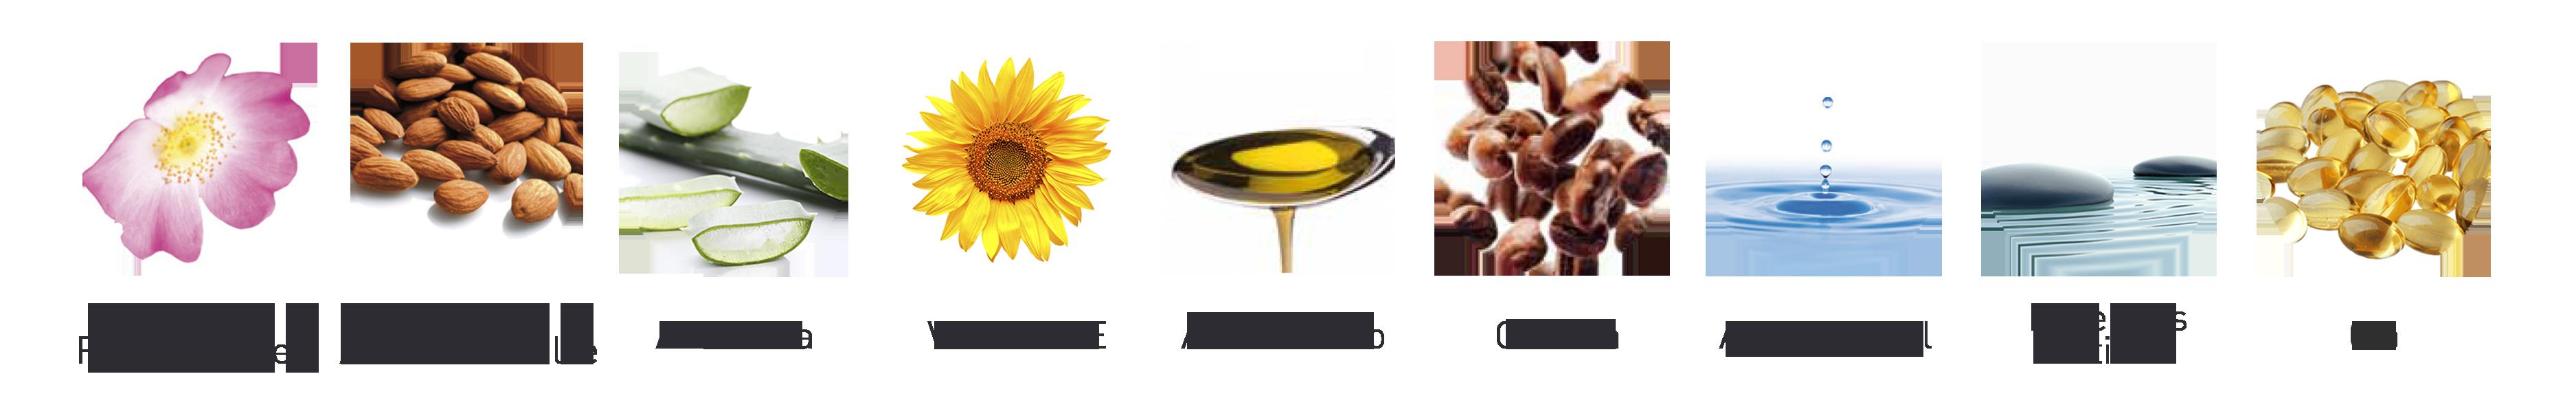 Ingredientes cosmetotextiles NOVAREL